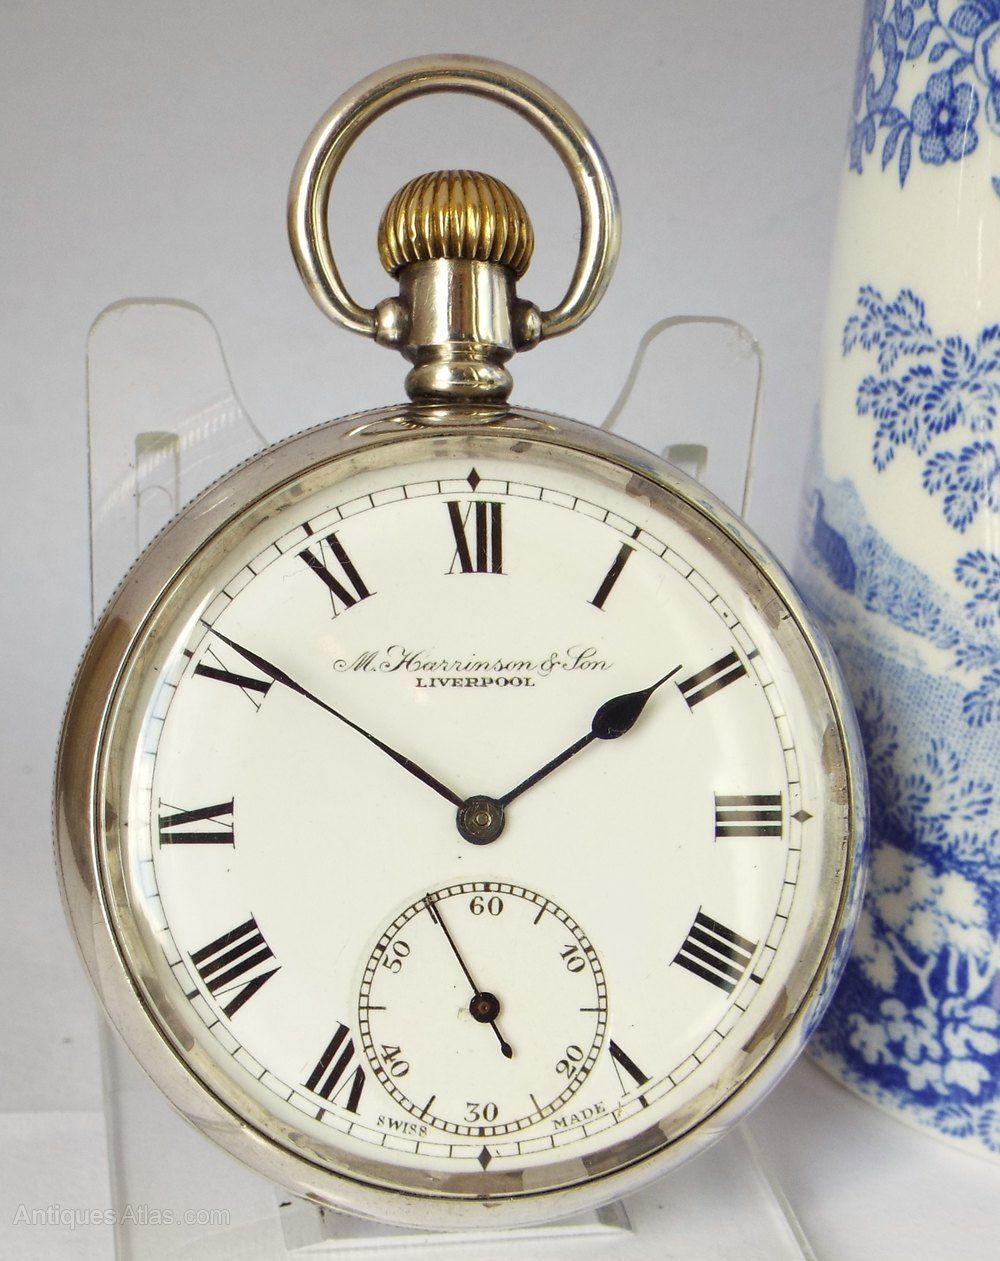 91f81b267 Antiques Atlas - Antique Silver Pocket Watch By Tavannes Watch Co ...